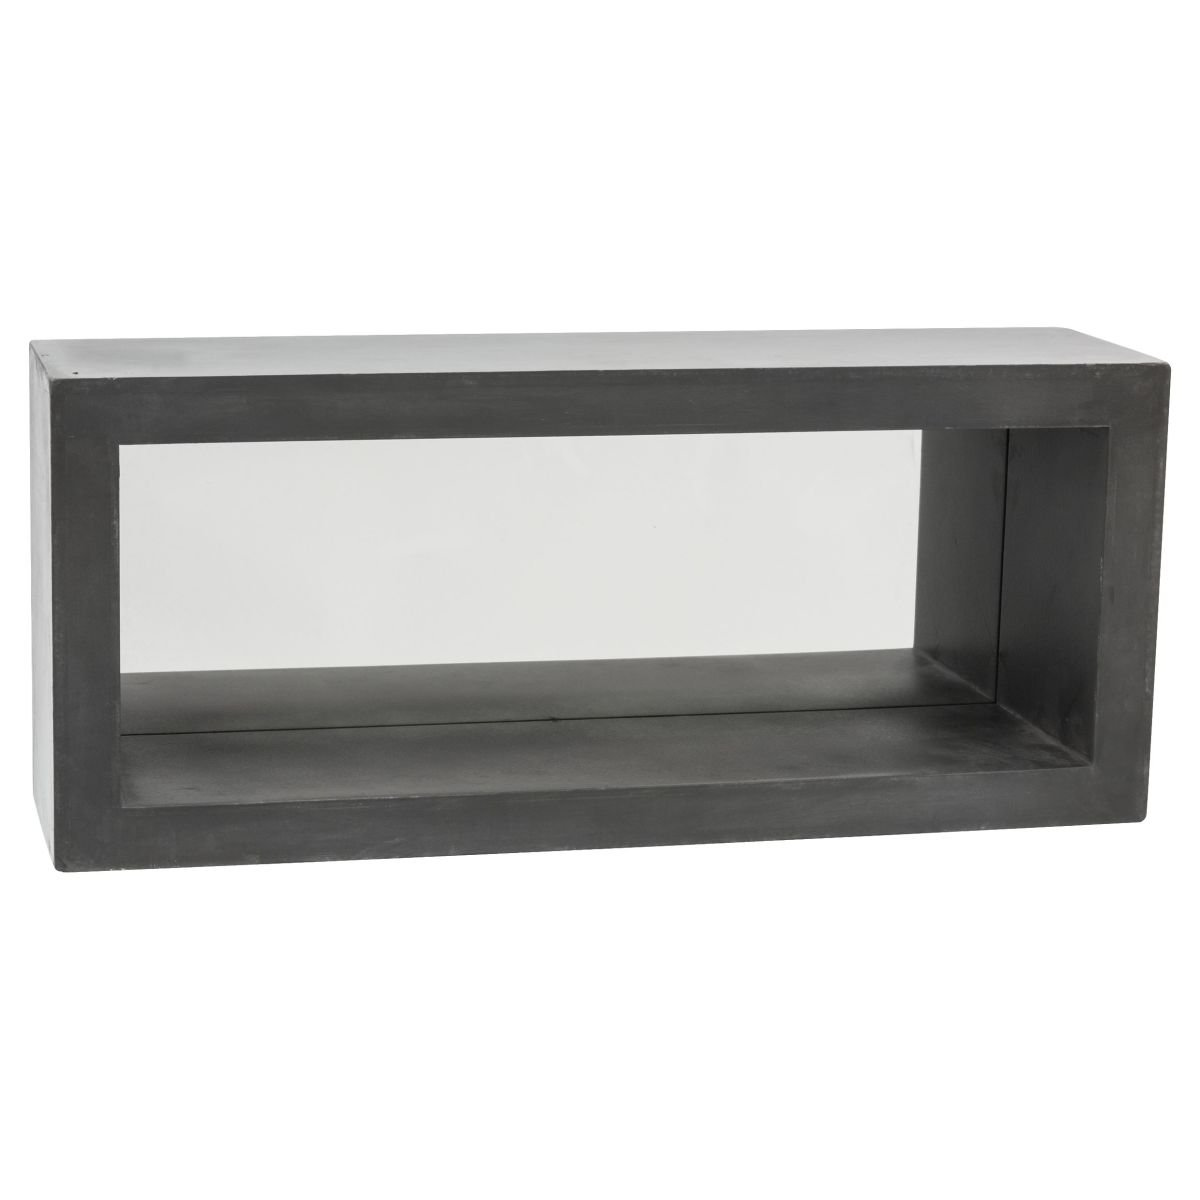 Wandregal betonoptik : Miavilla wandregal felix beton optik spiegel mdf grau 70 cm breit